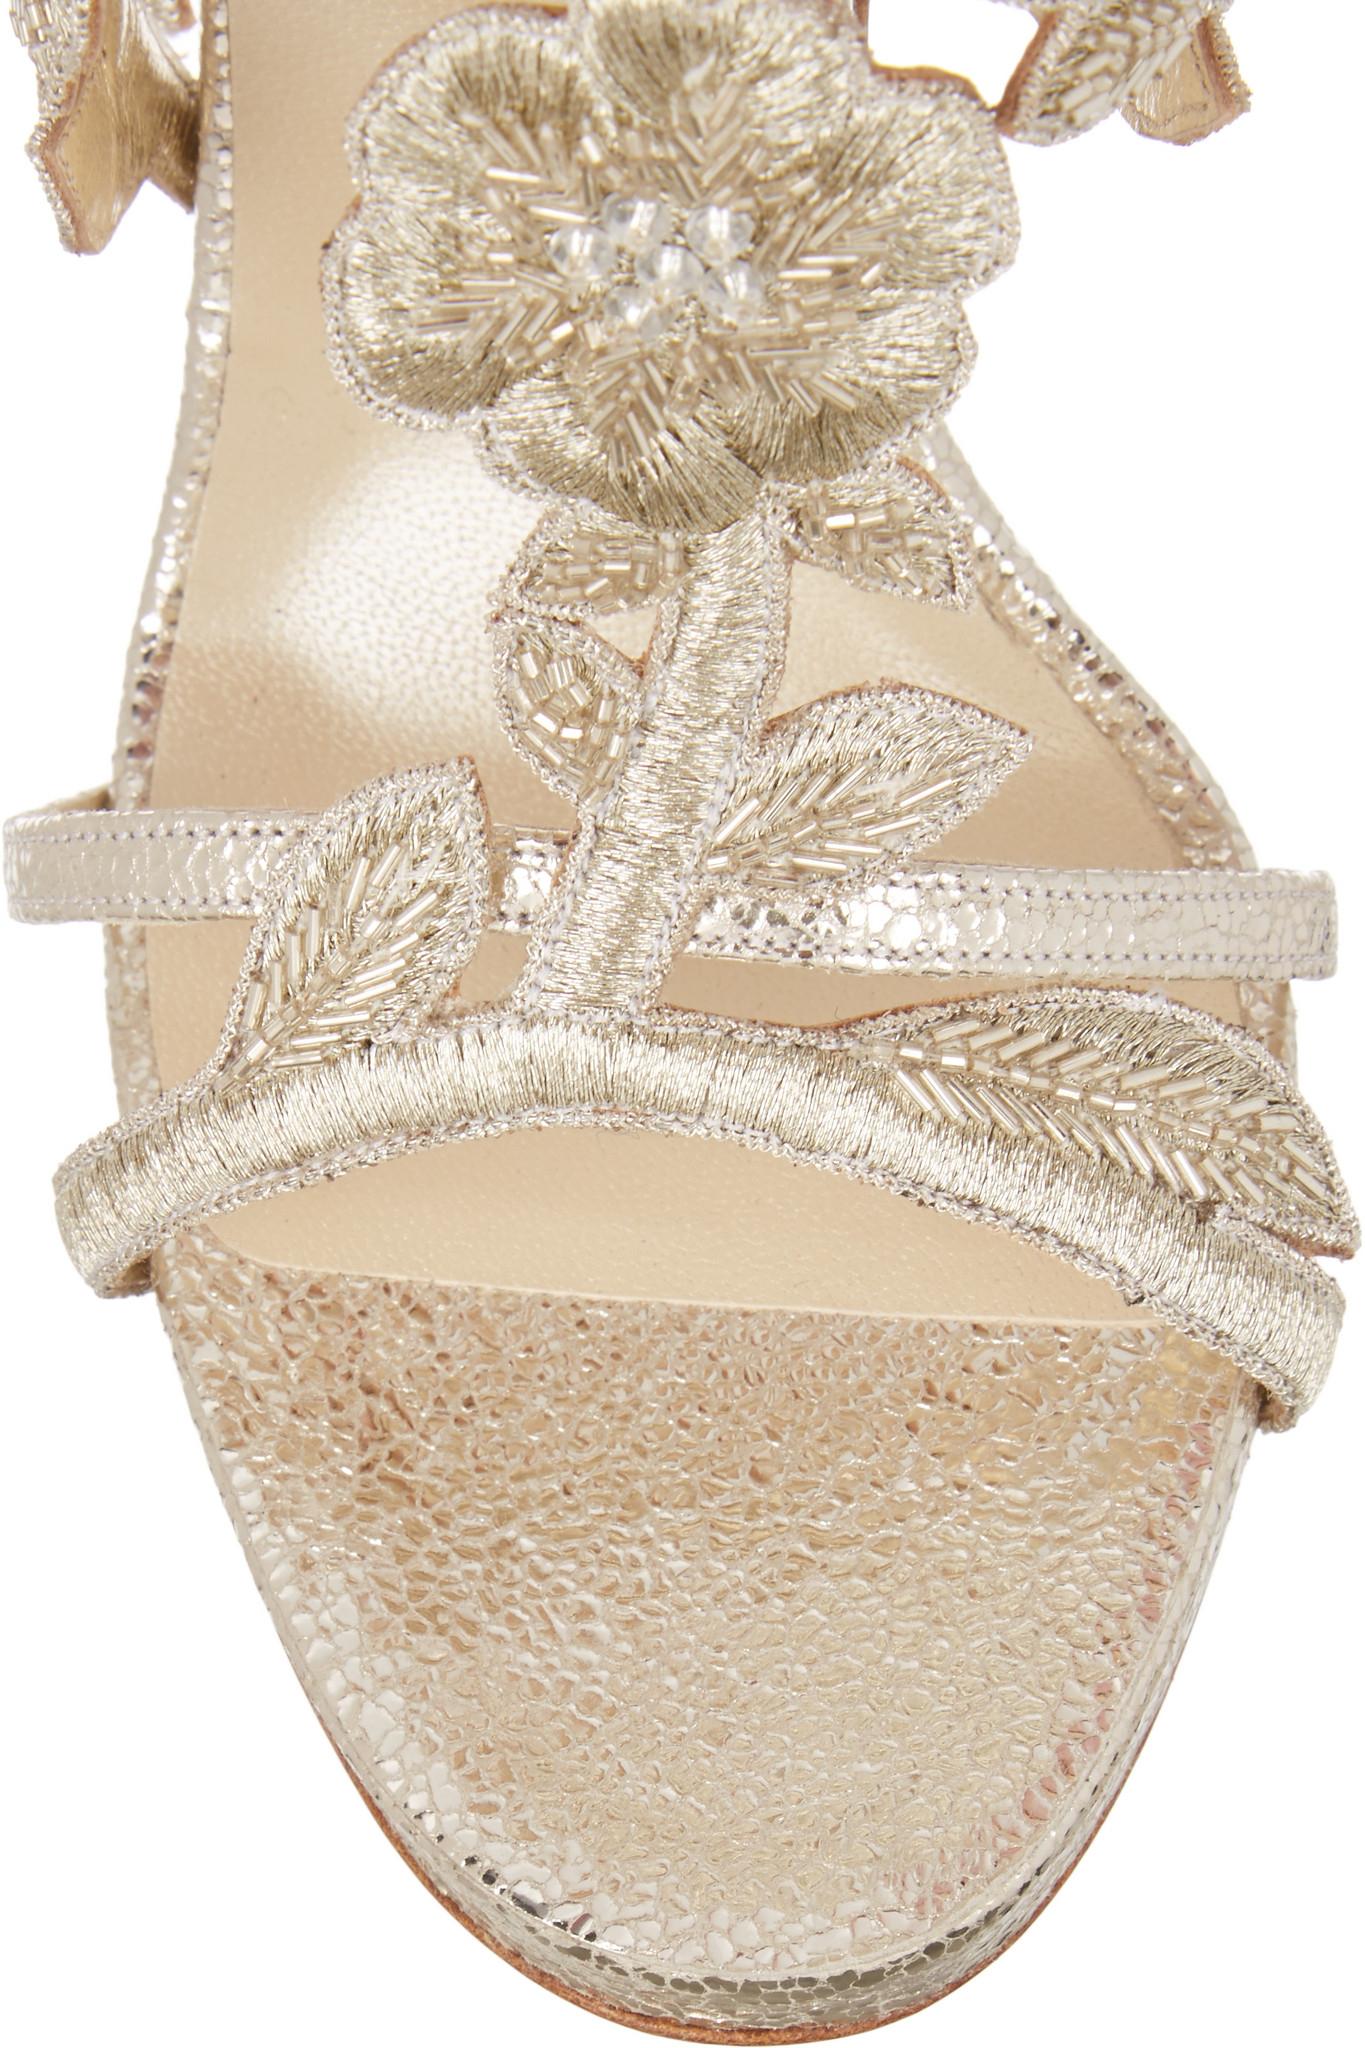 fd3d21110ae1 Lyst - Oscar de la Renta Tatum Embellished Metallic Cracked-leather ...